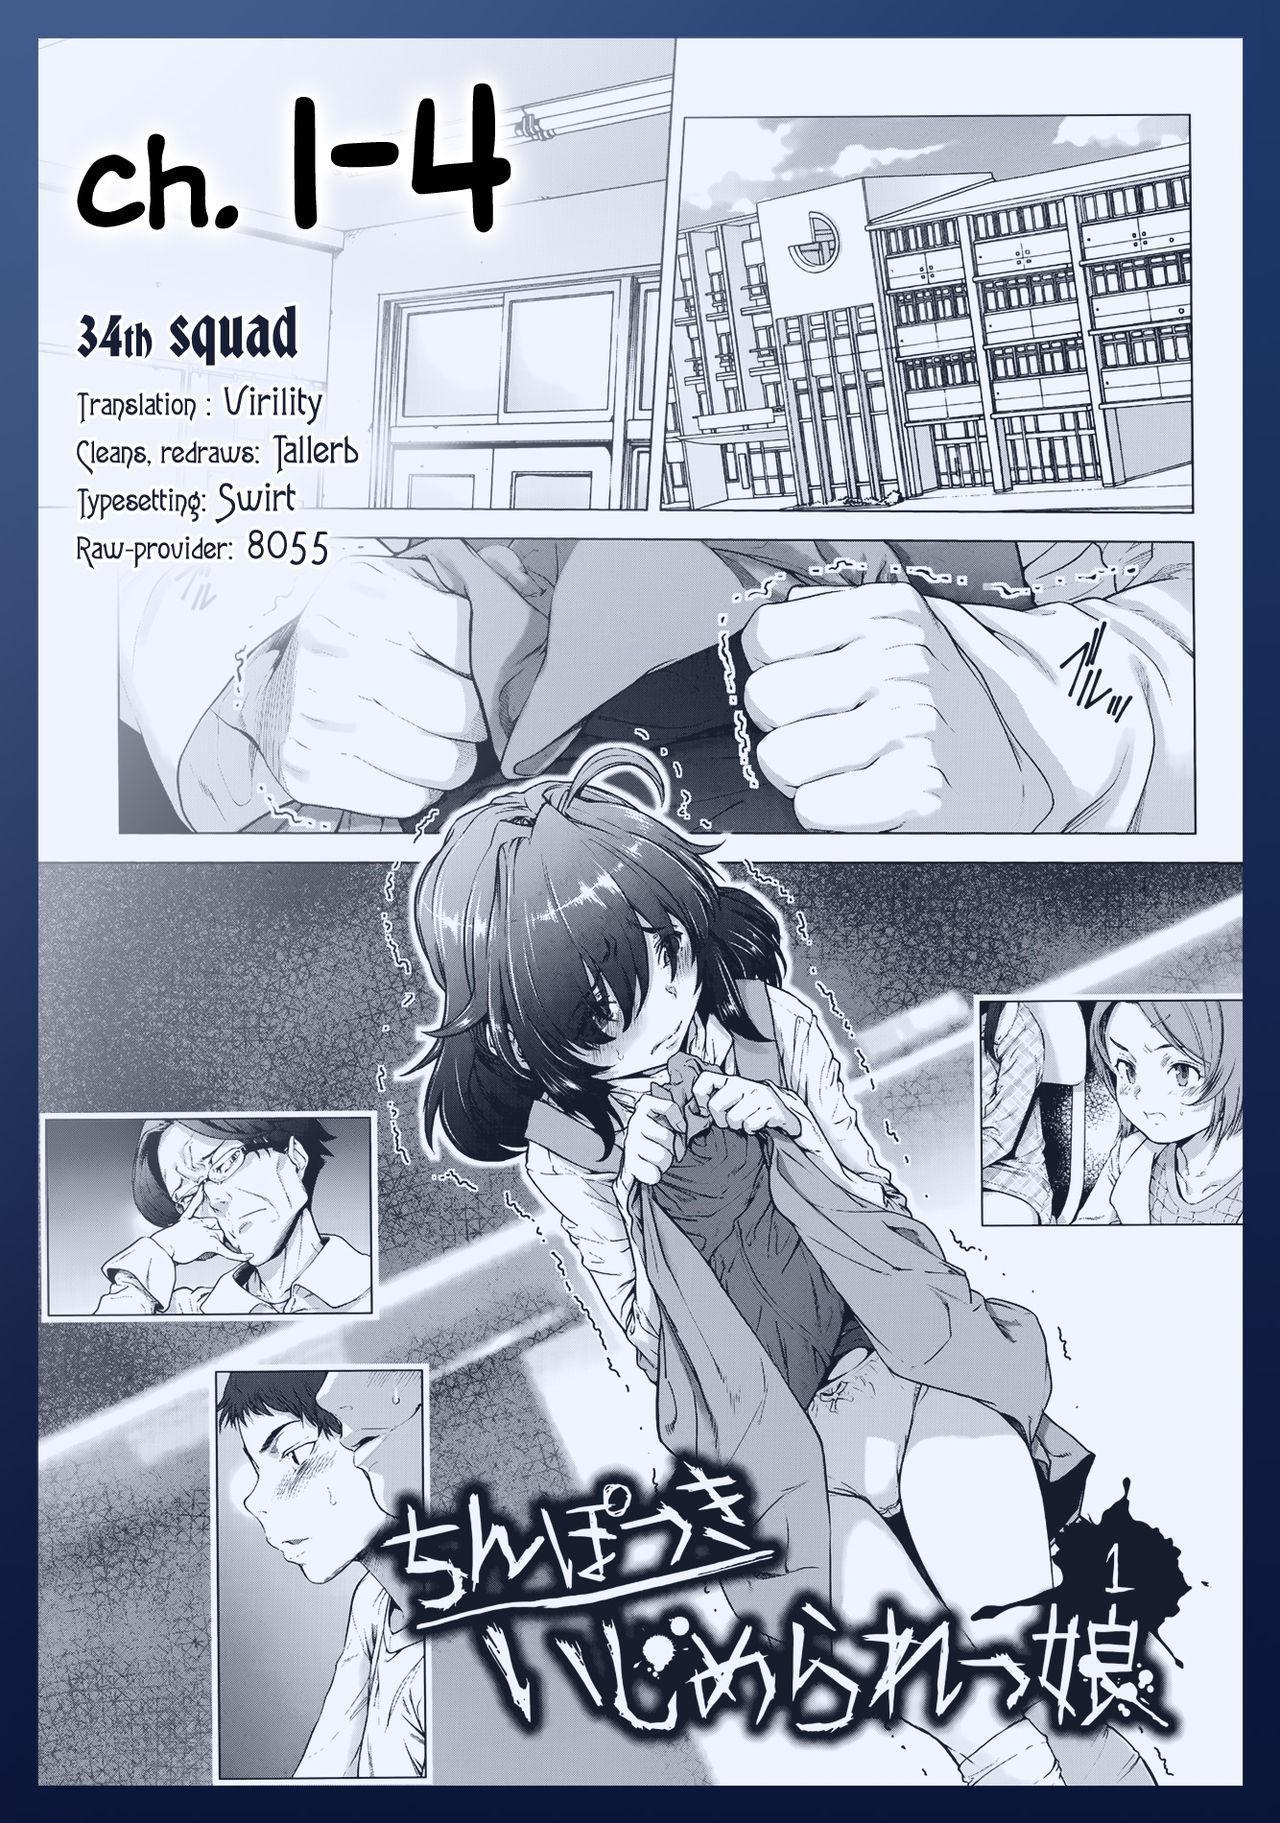 [Sannyuutei Shinta] Chinpotsuki Ijimerarekko | «Dickgirl!», The Bullying Story - Ch. 1-4 [English] [34th squad] 0